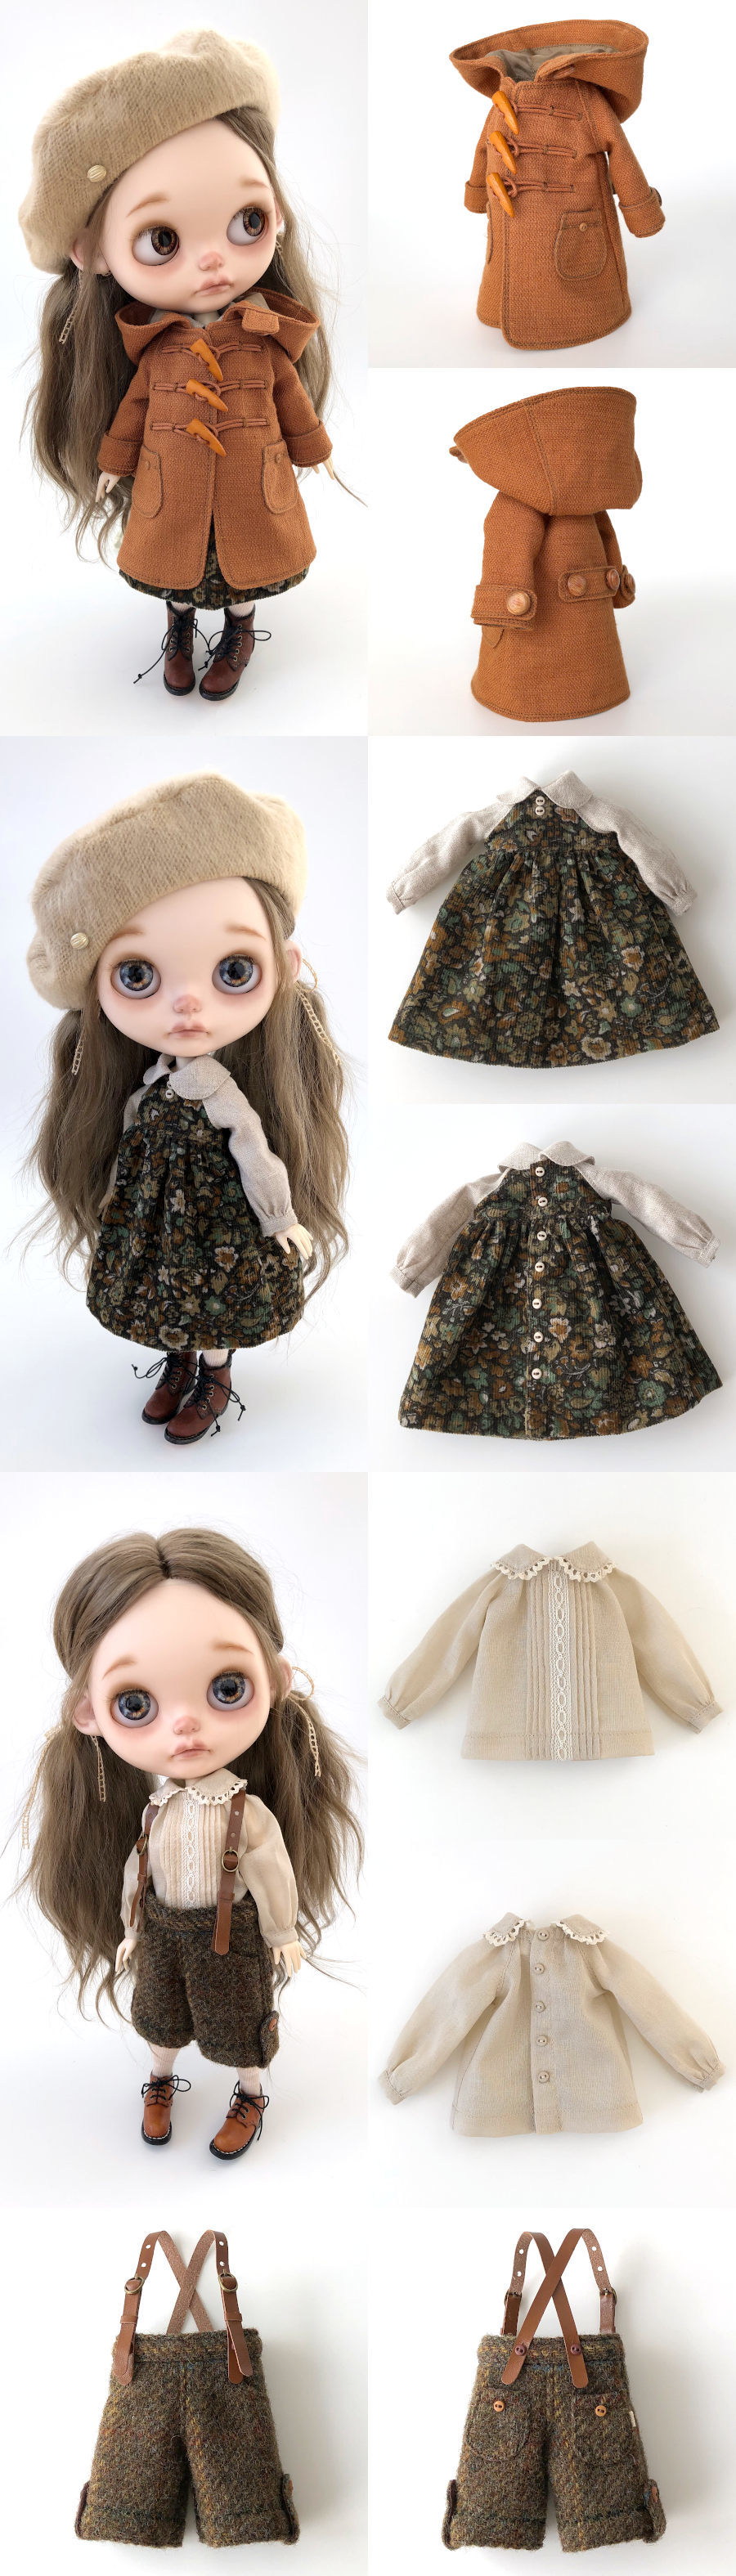 *lucalily * dolls clothes * Brown duffle coat set *_d0217189_10163561.jpeg